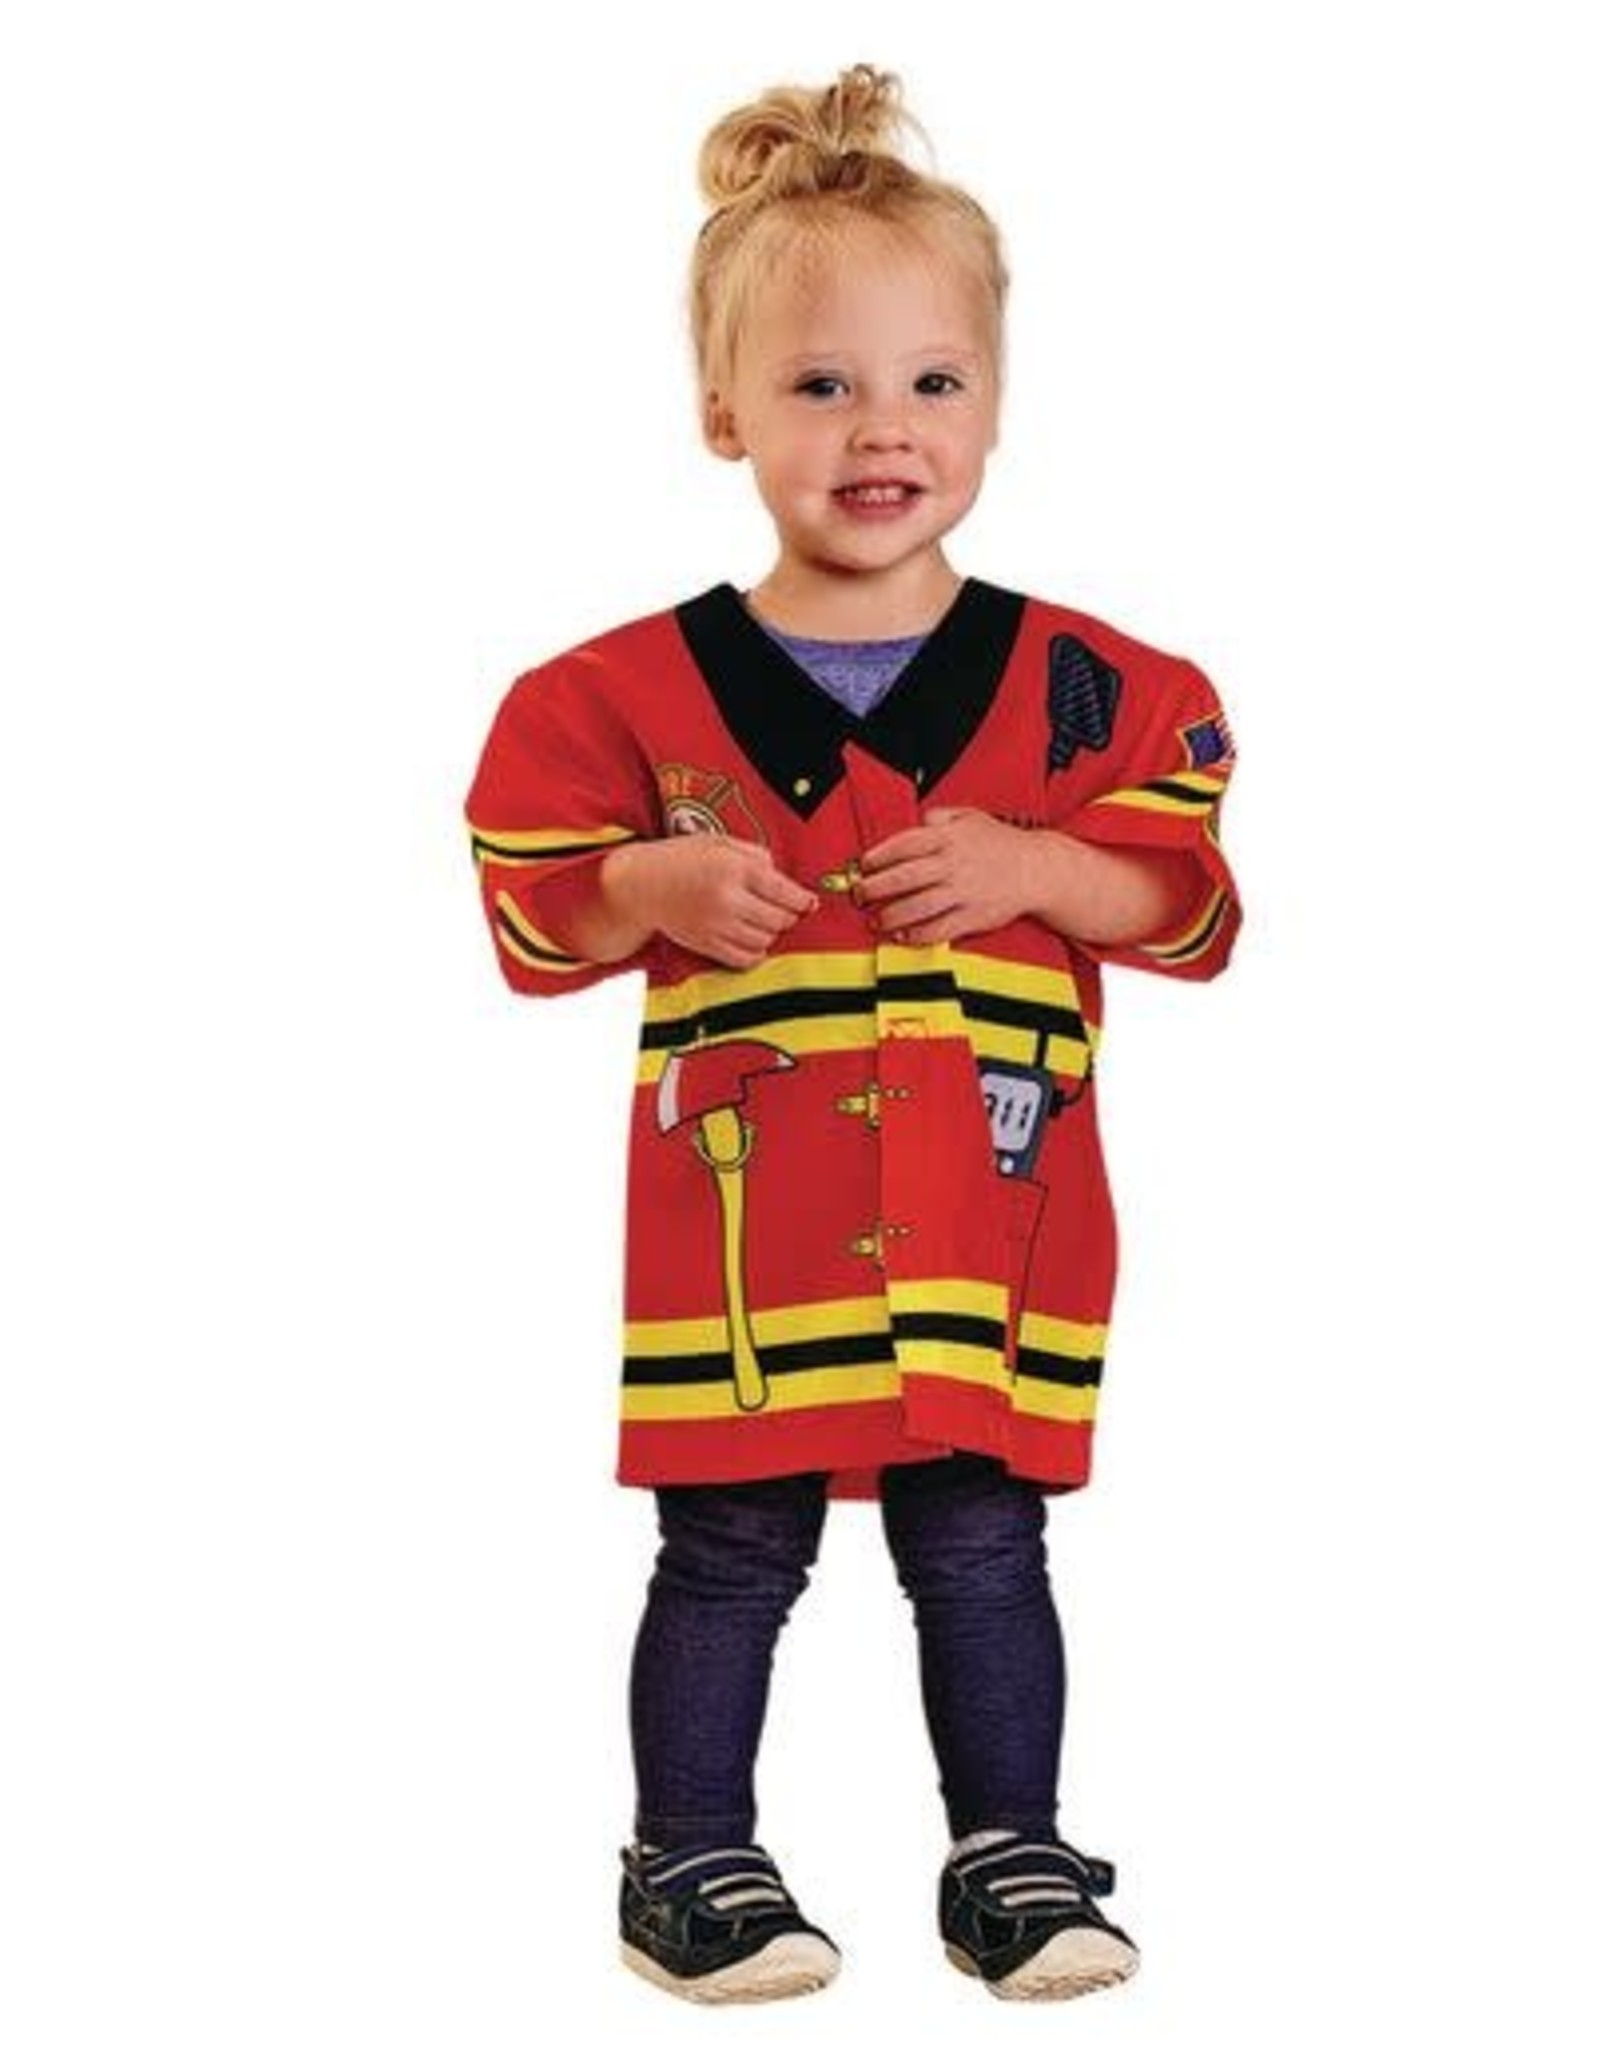 Firefighter my 1sr career size 18-36 months